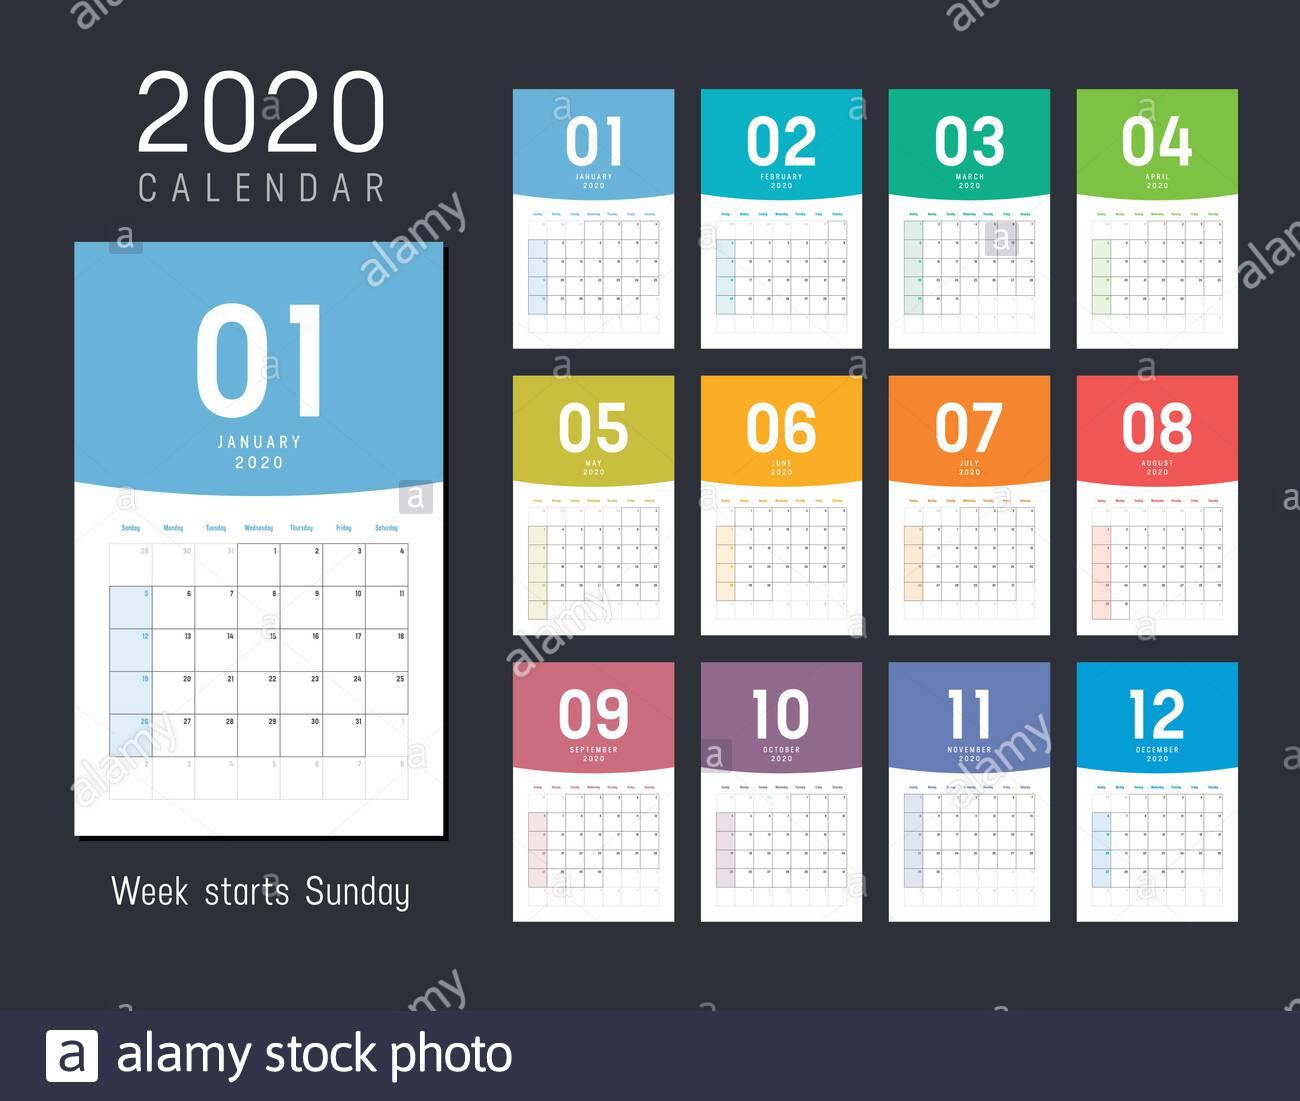 Year 2020 Monthly Desk Calendar. Week Starts Sunday. Vector